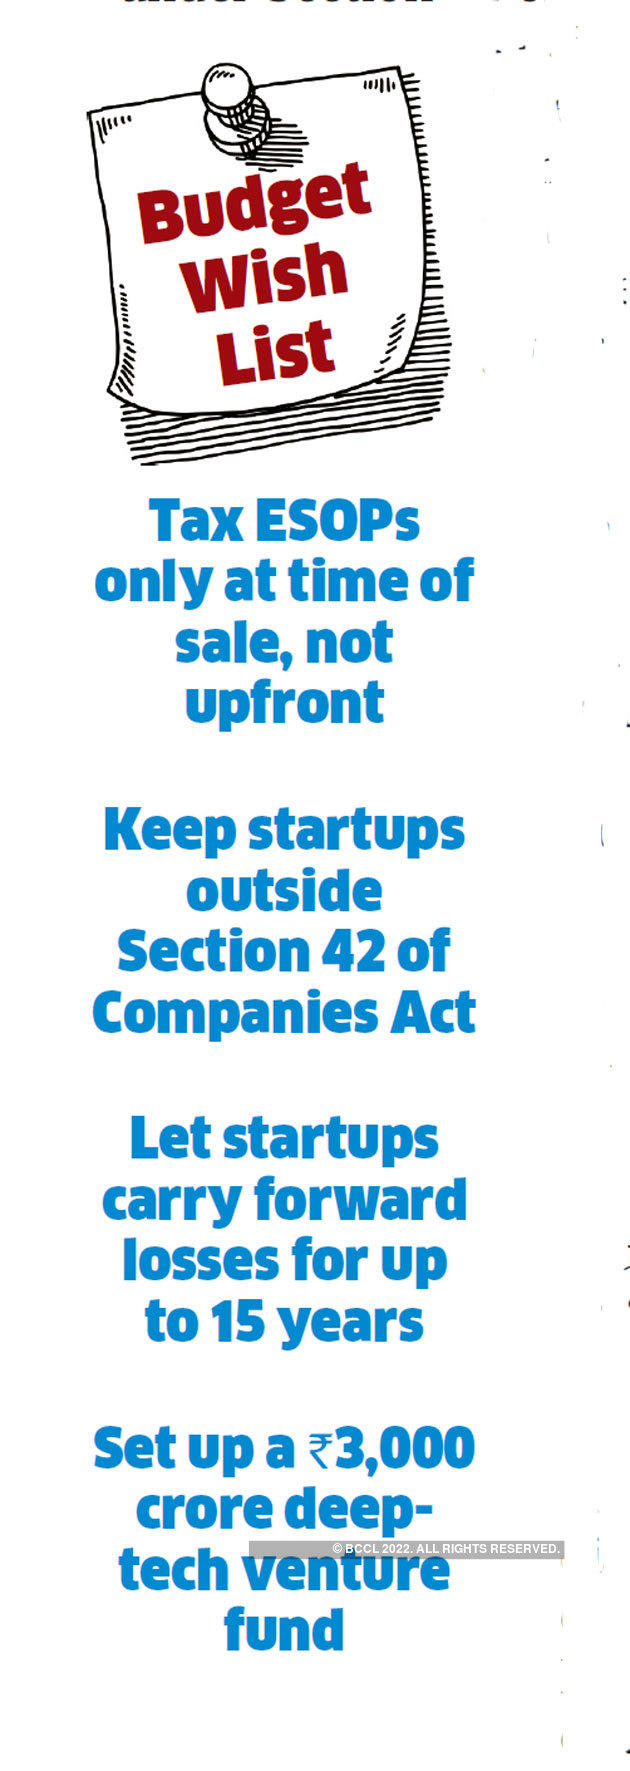 Startups: Waiting for regulatory relief